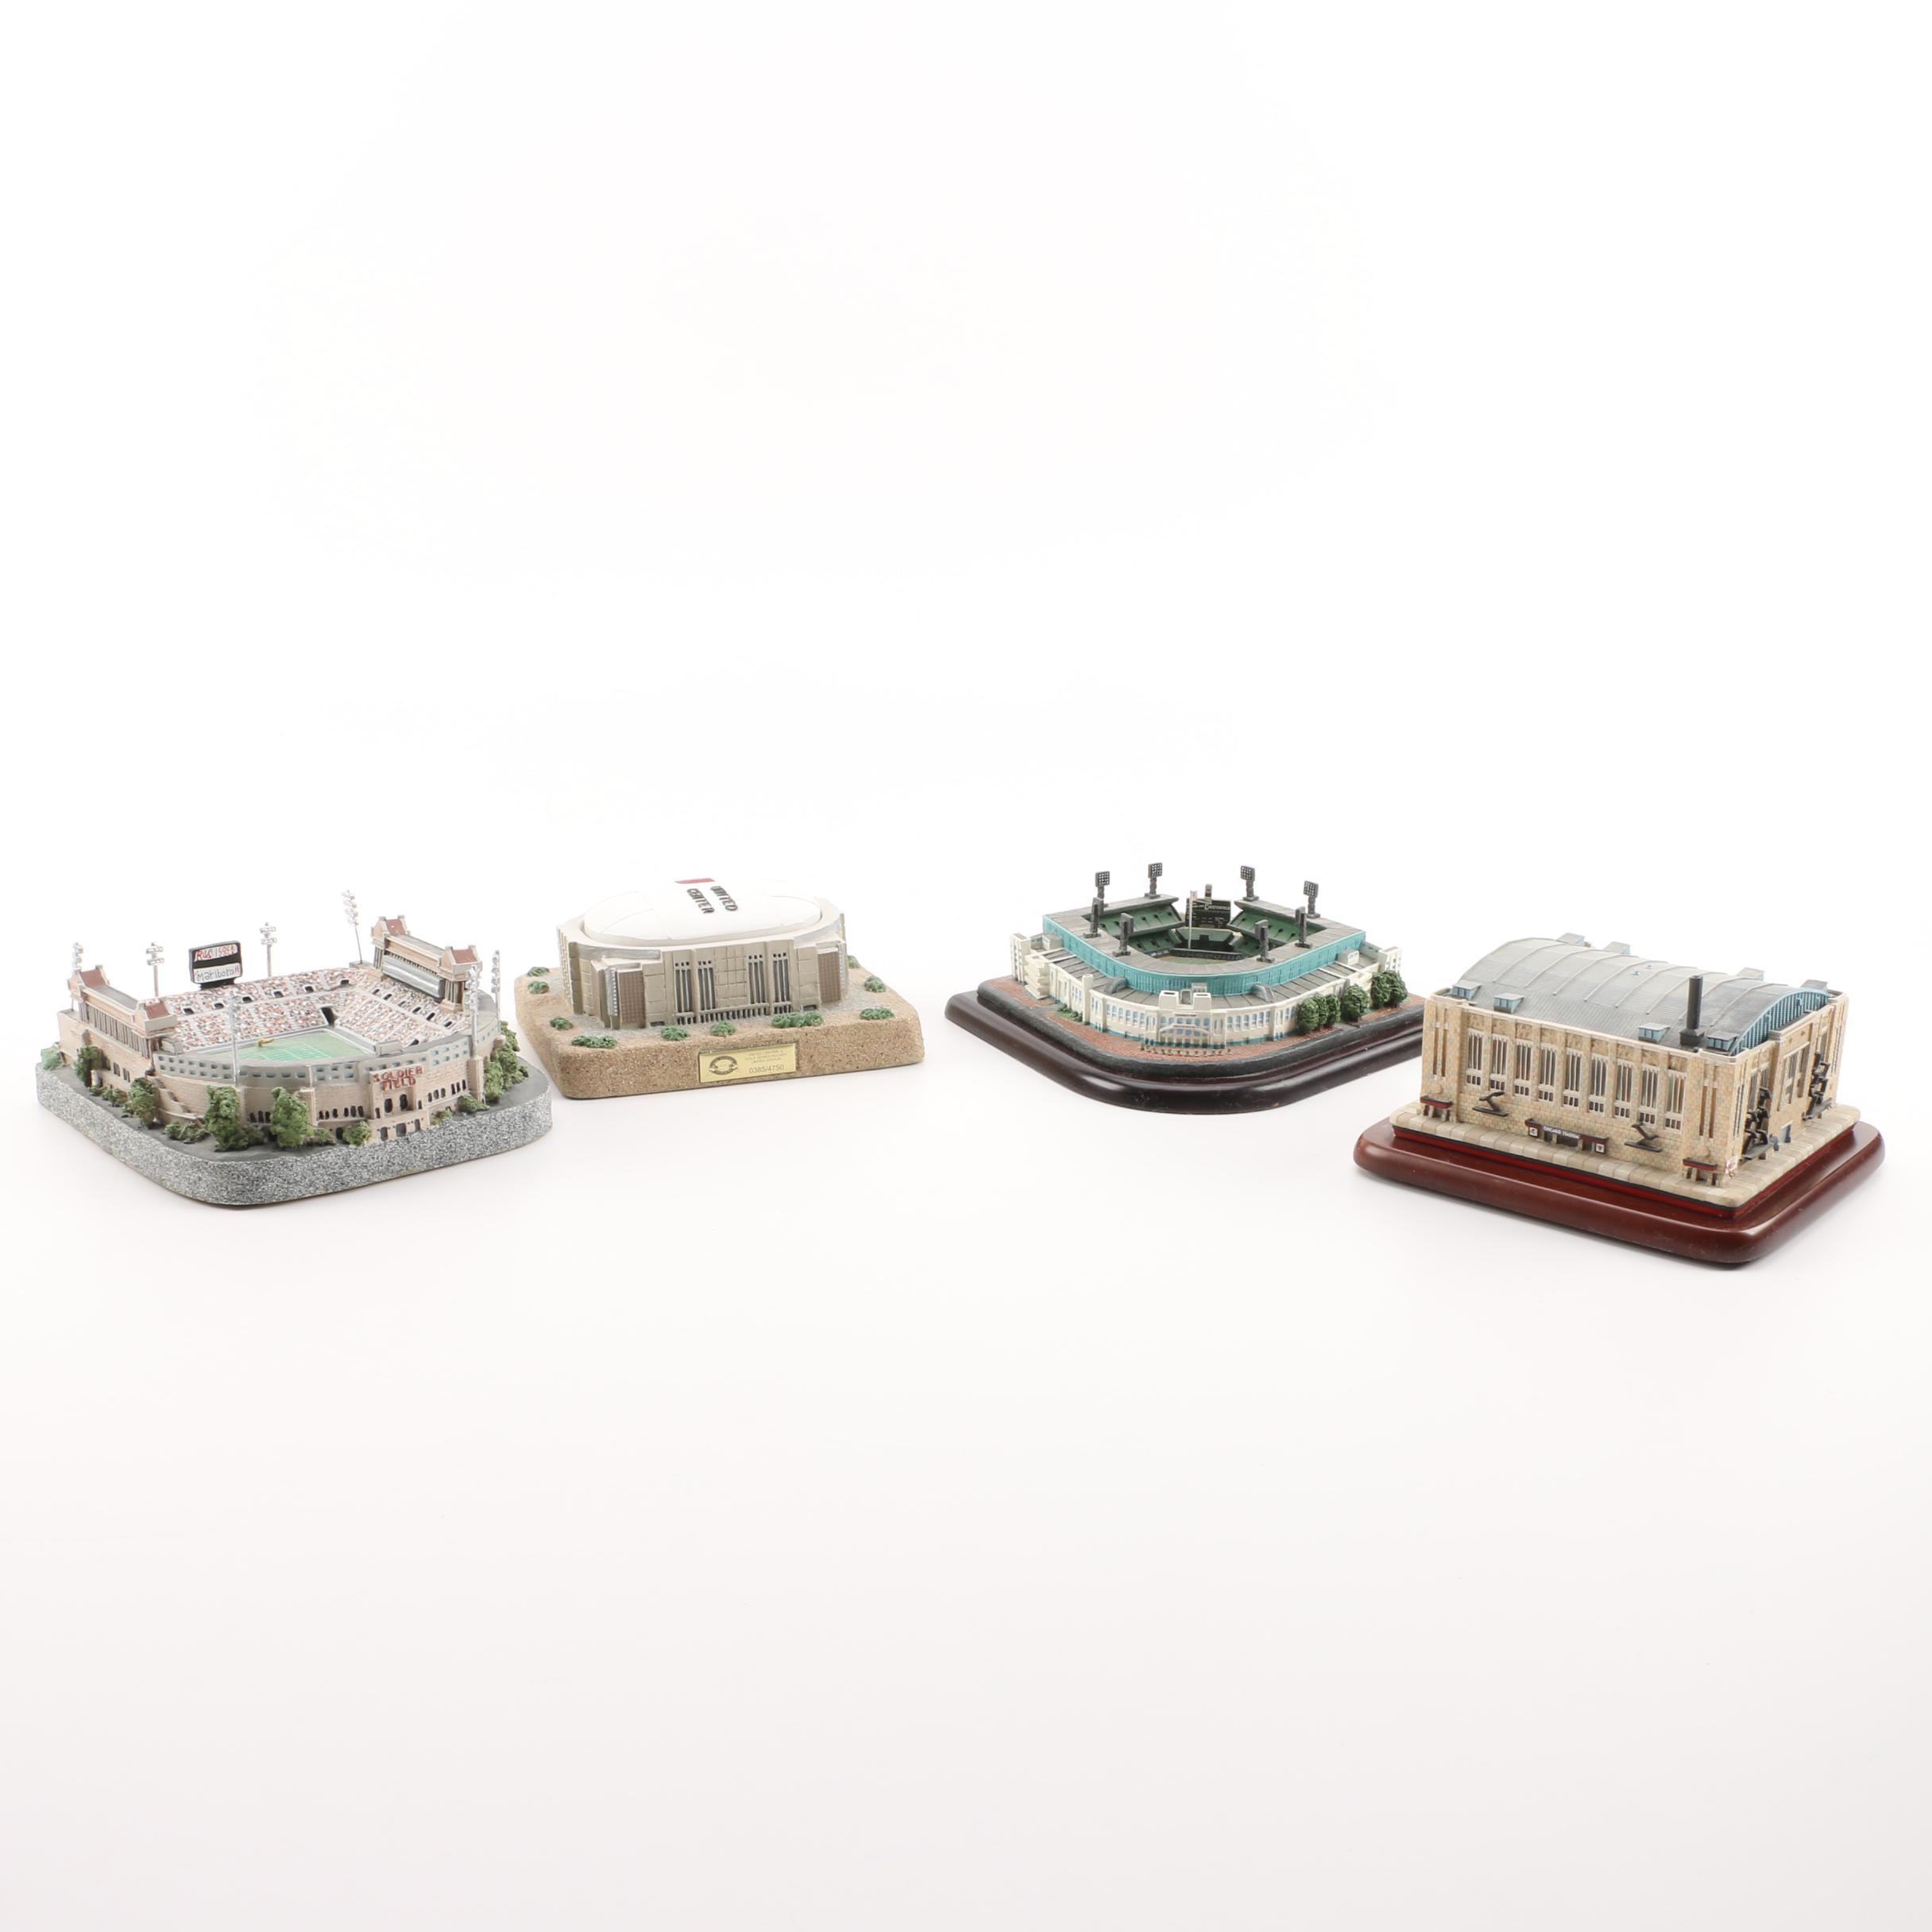 Limited Edition Miniature Illinois Sports Arenas